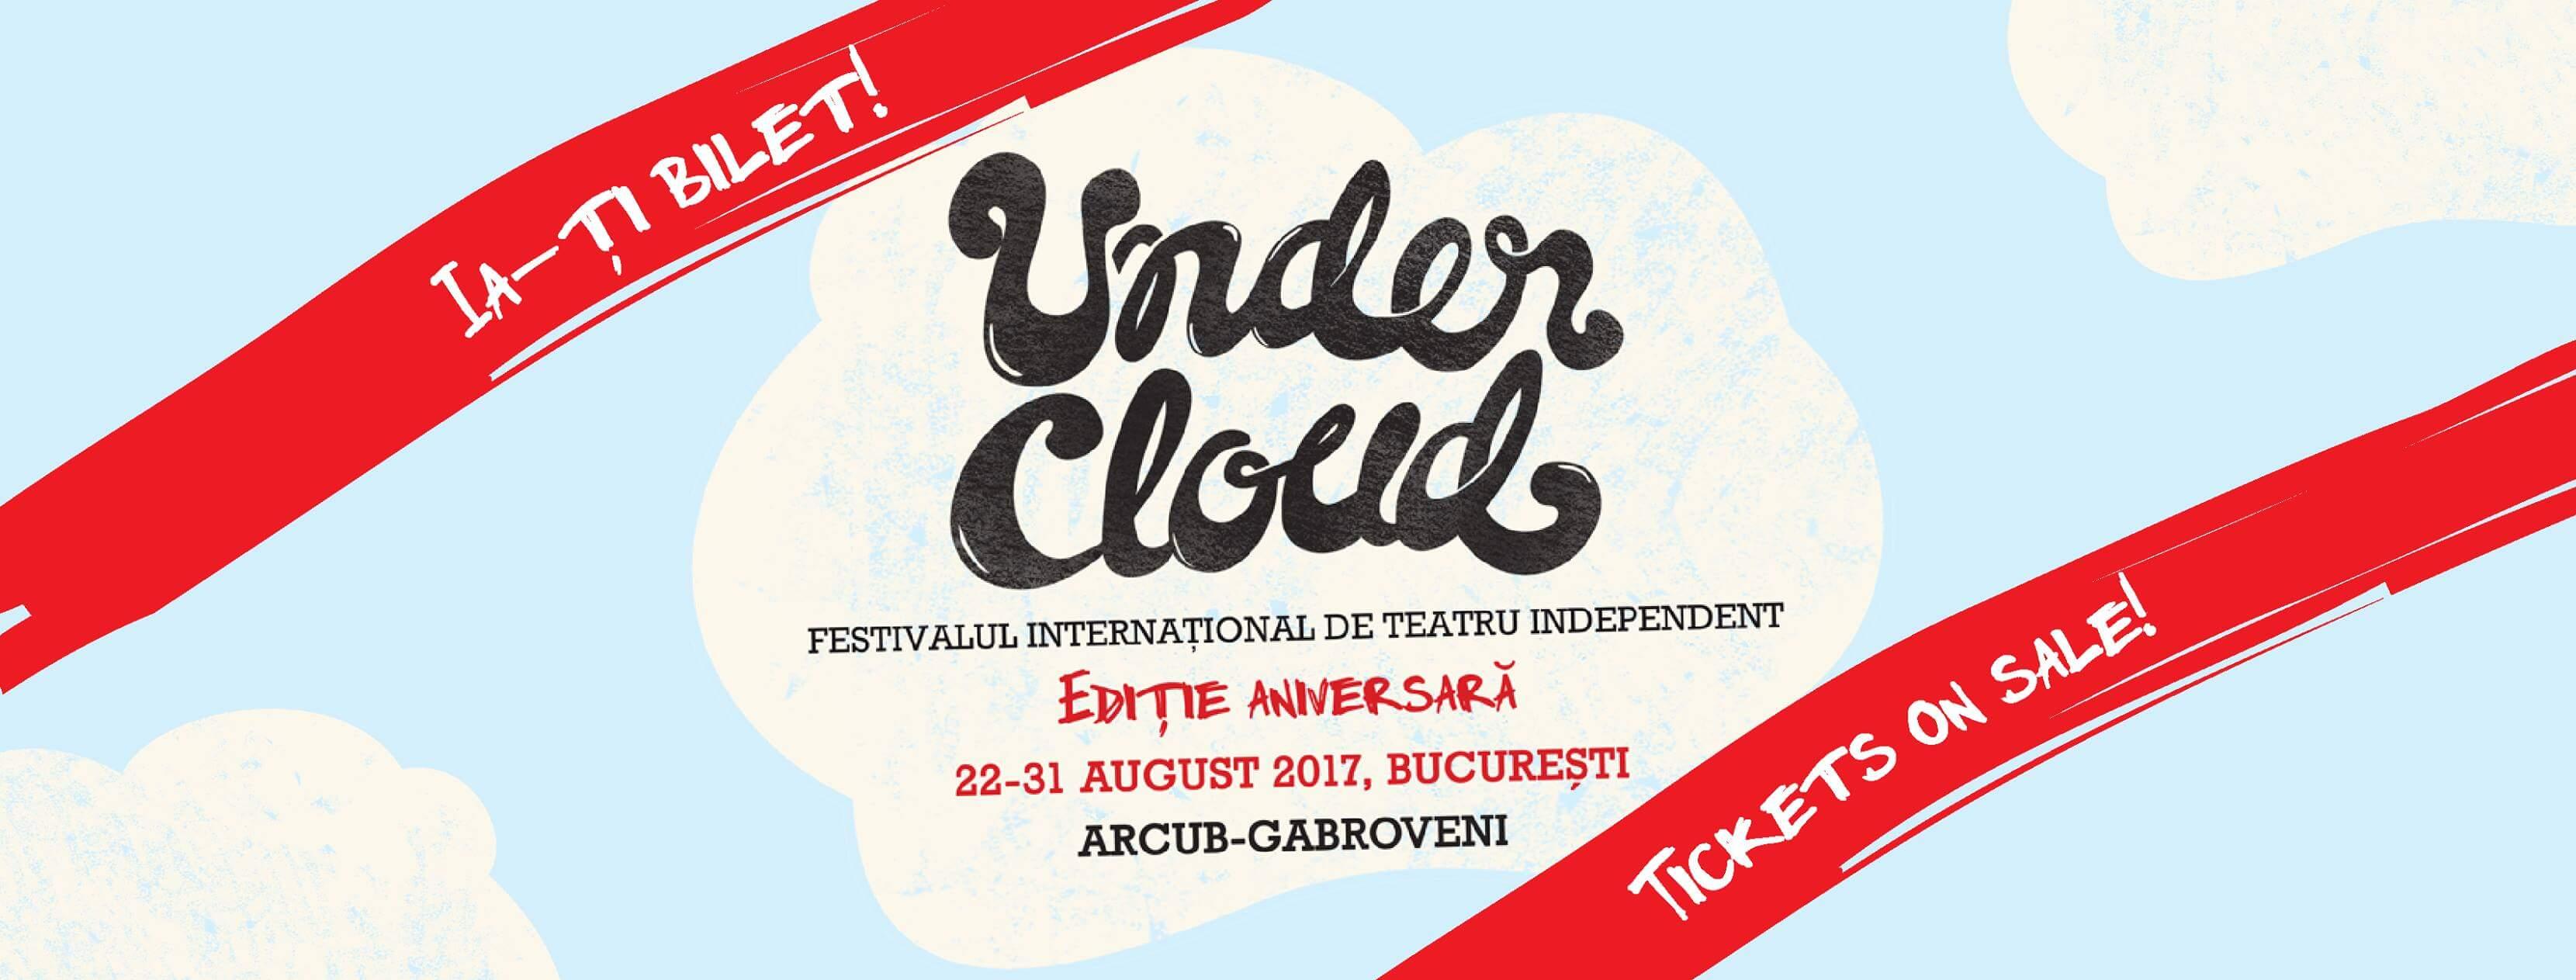 Banner_Undercloud_Editie aniversara